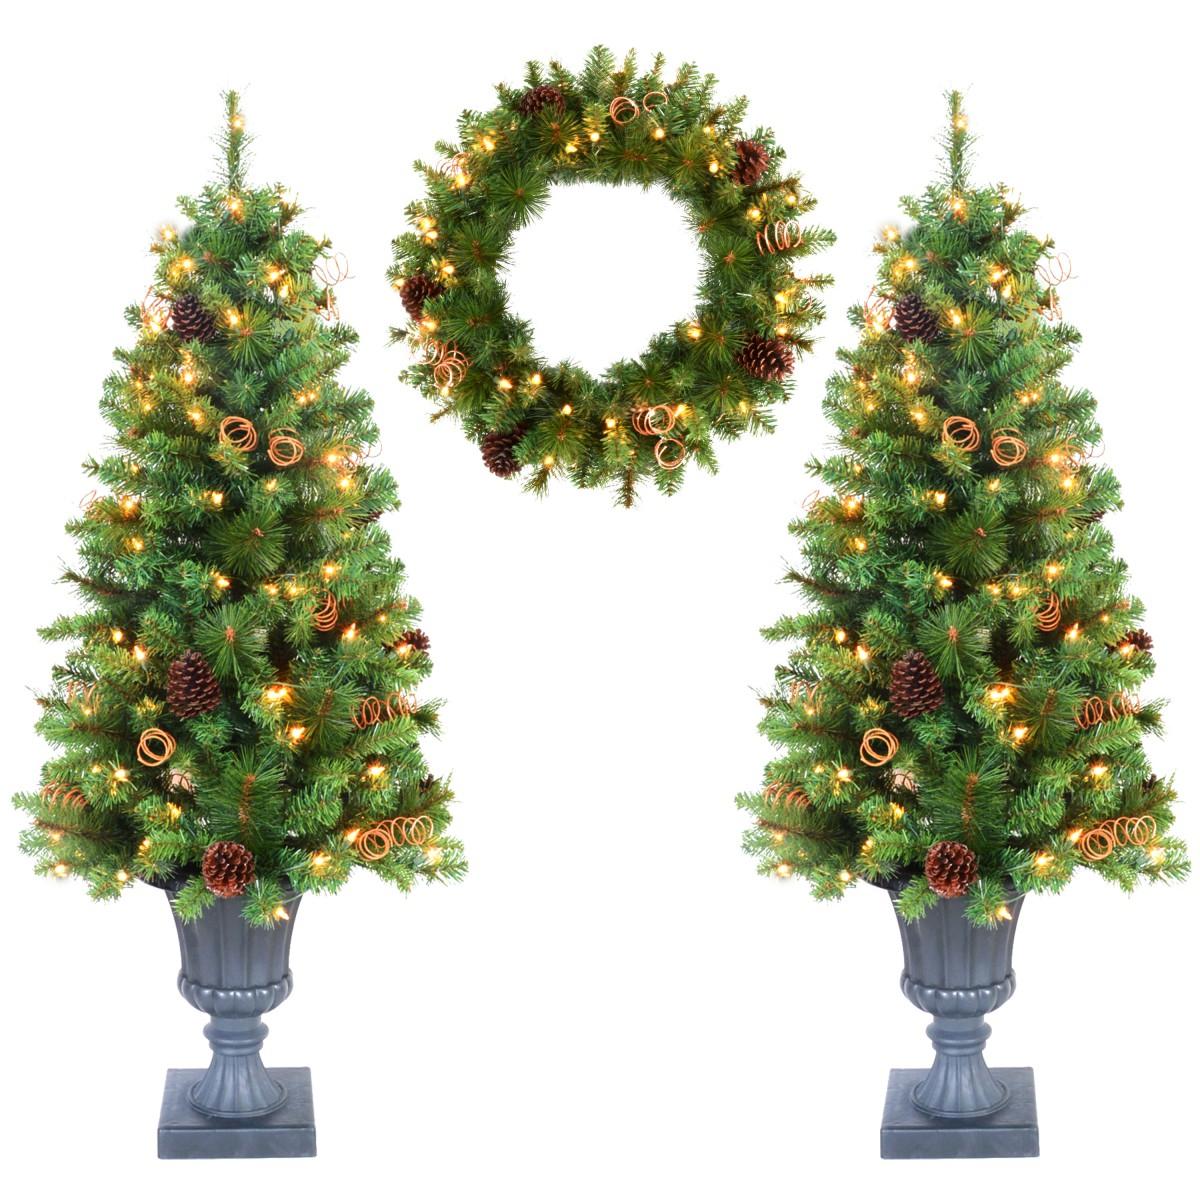 4ft Christmas Tree.3 Piece 4ft Christmas Tree And Holiday Wreath Set